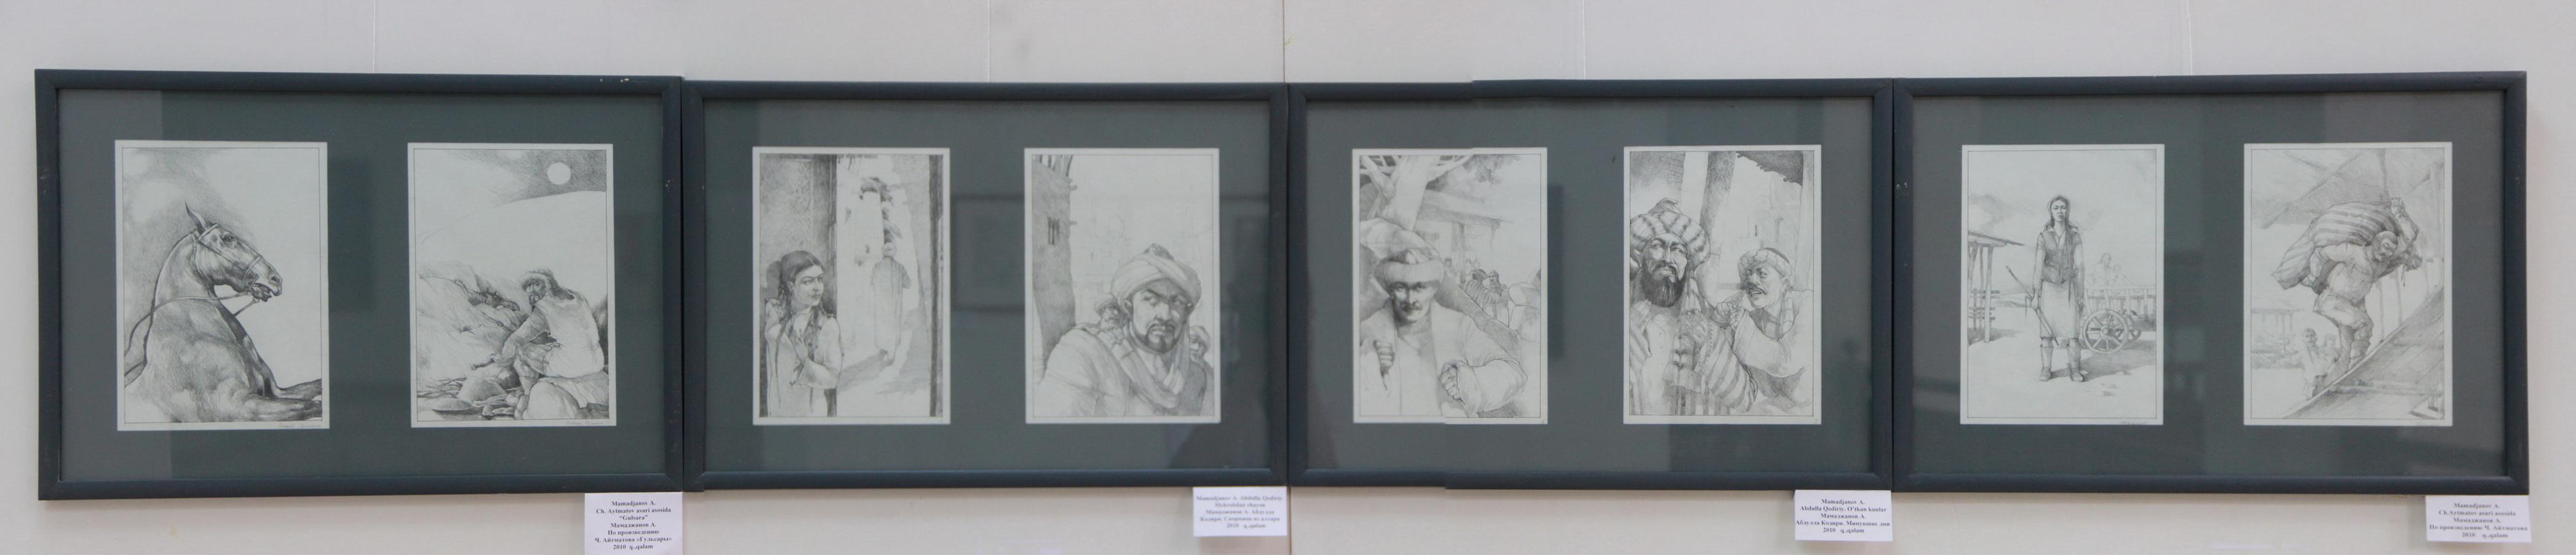 Экспозиция рисунков Мамаджанова Анвара